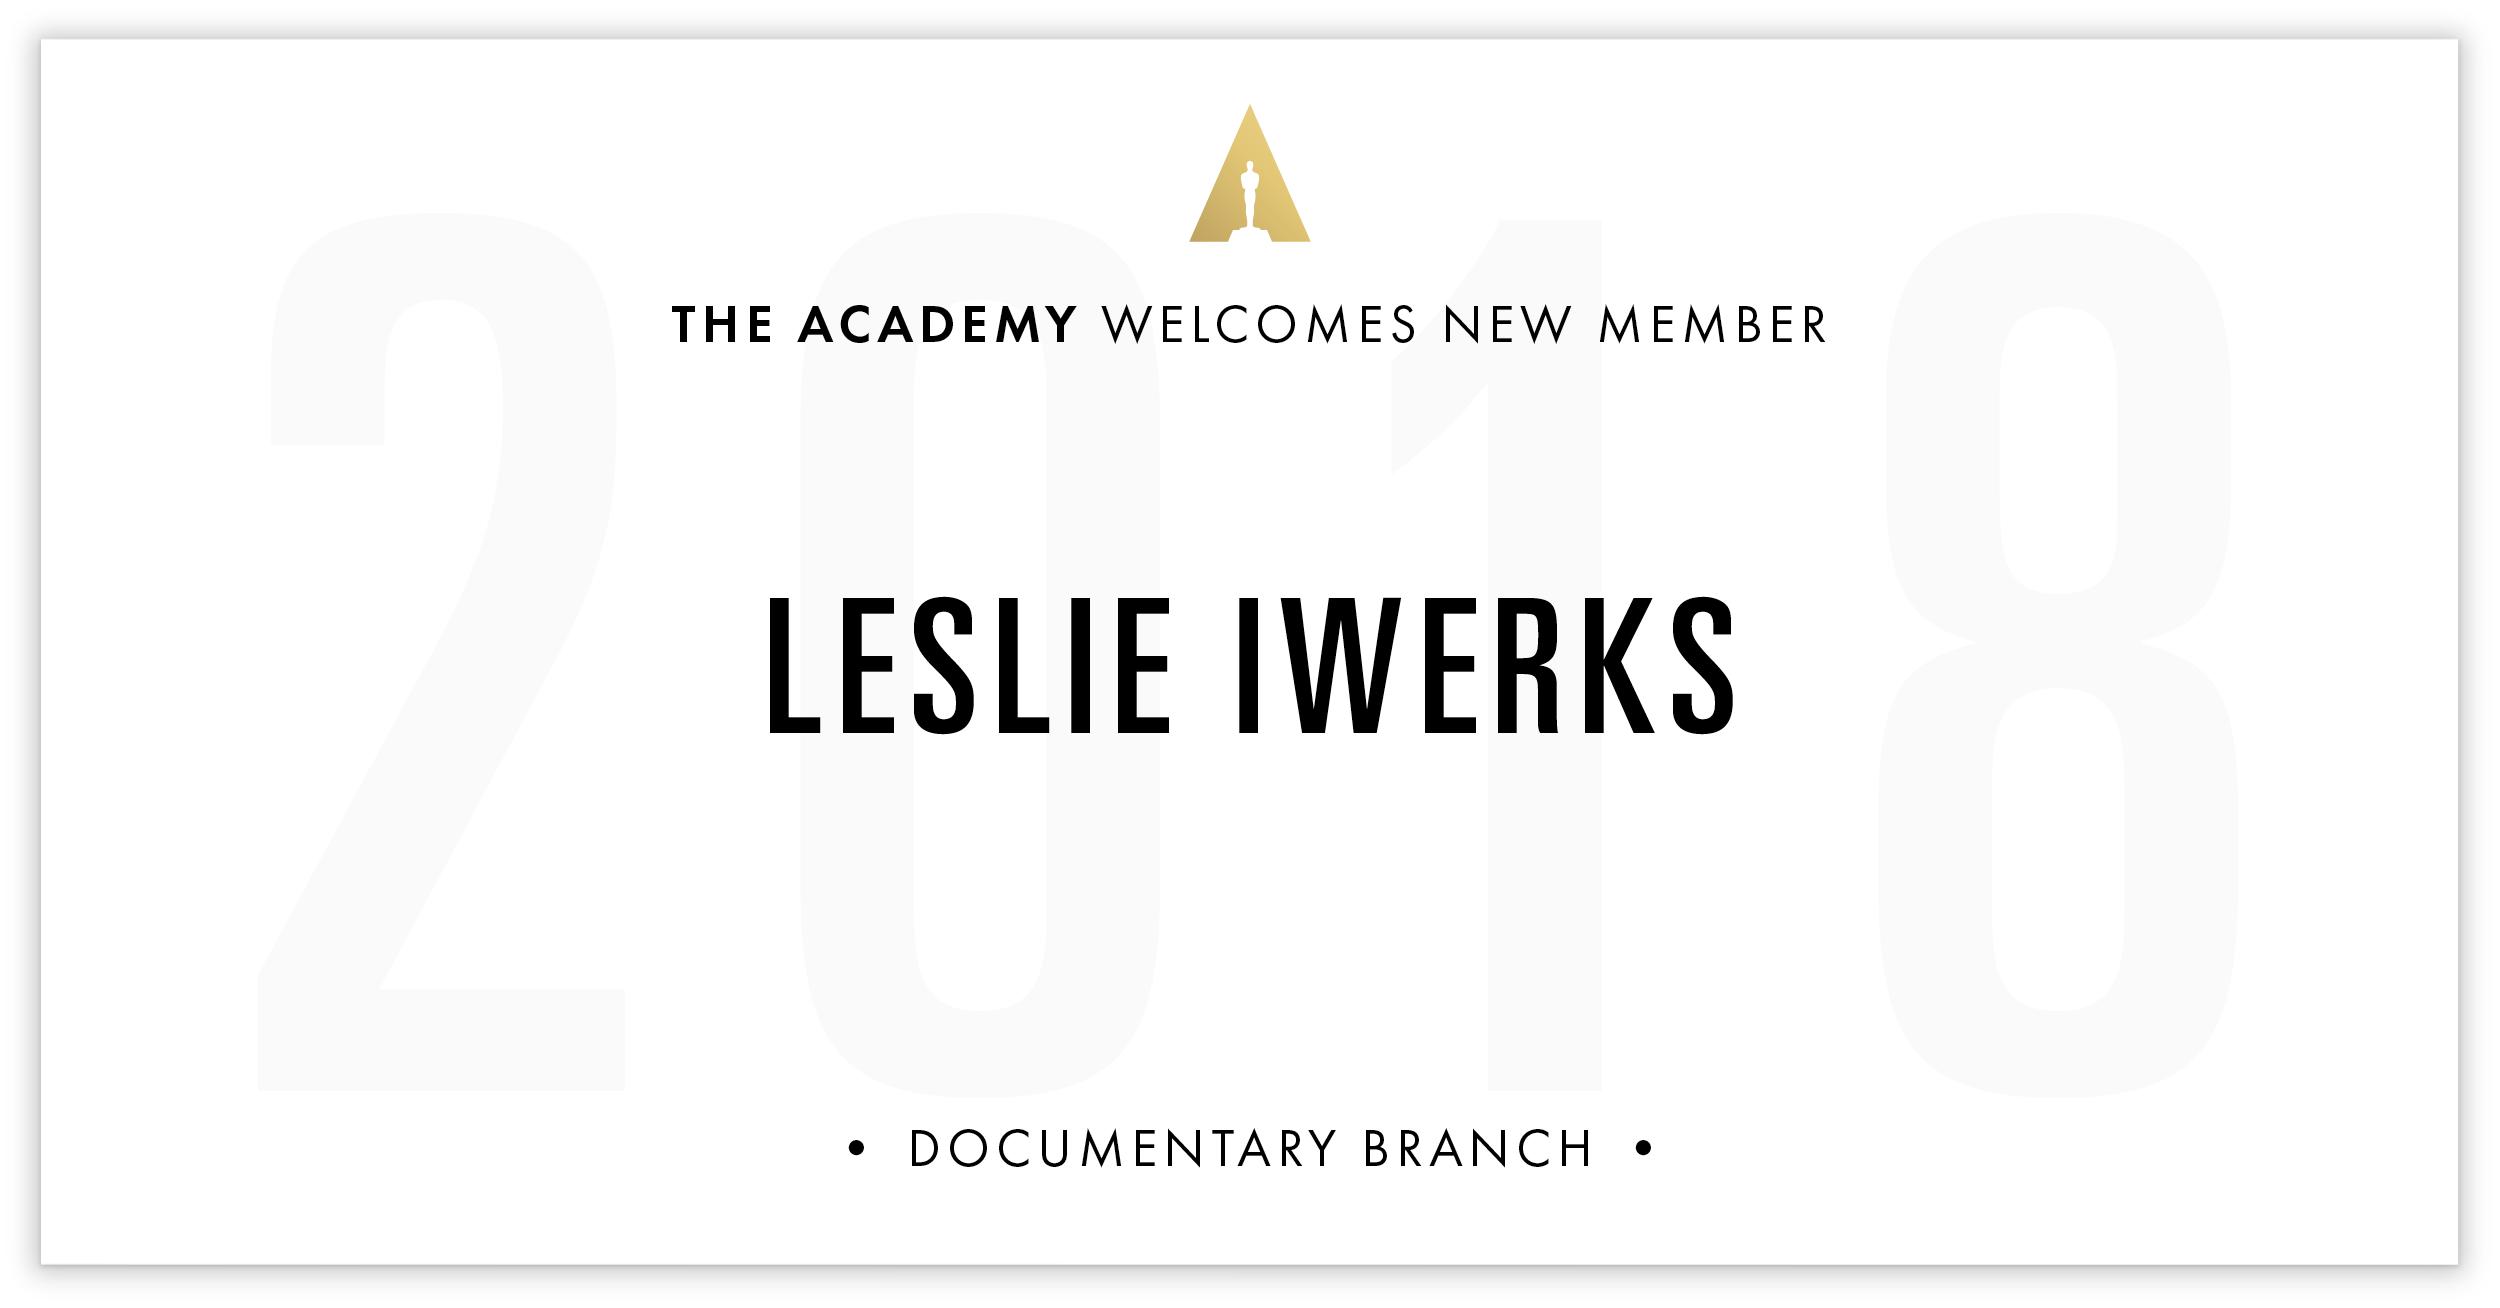 Leslie Iwerks is invited!